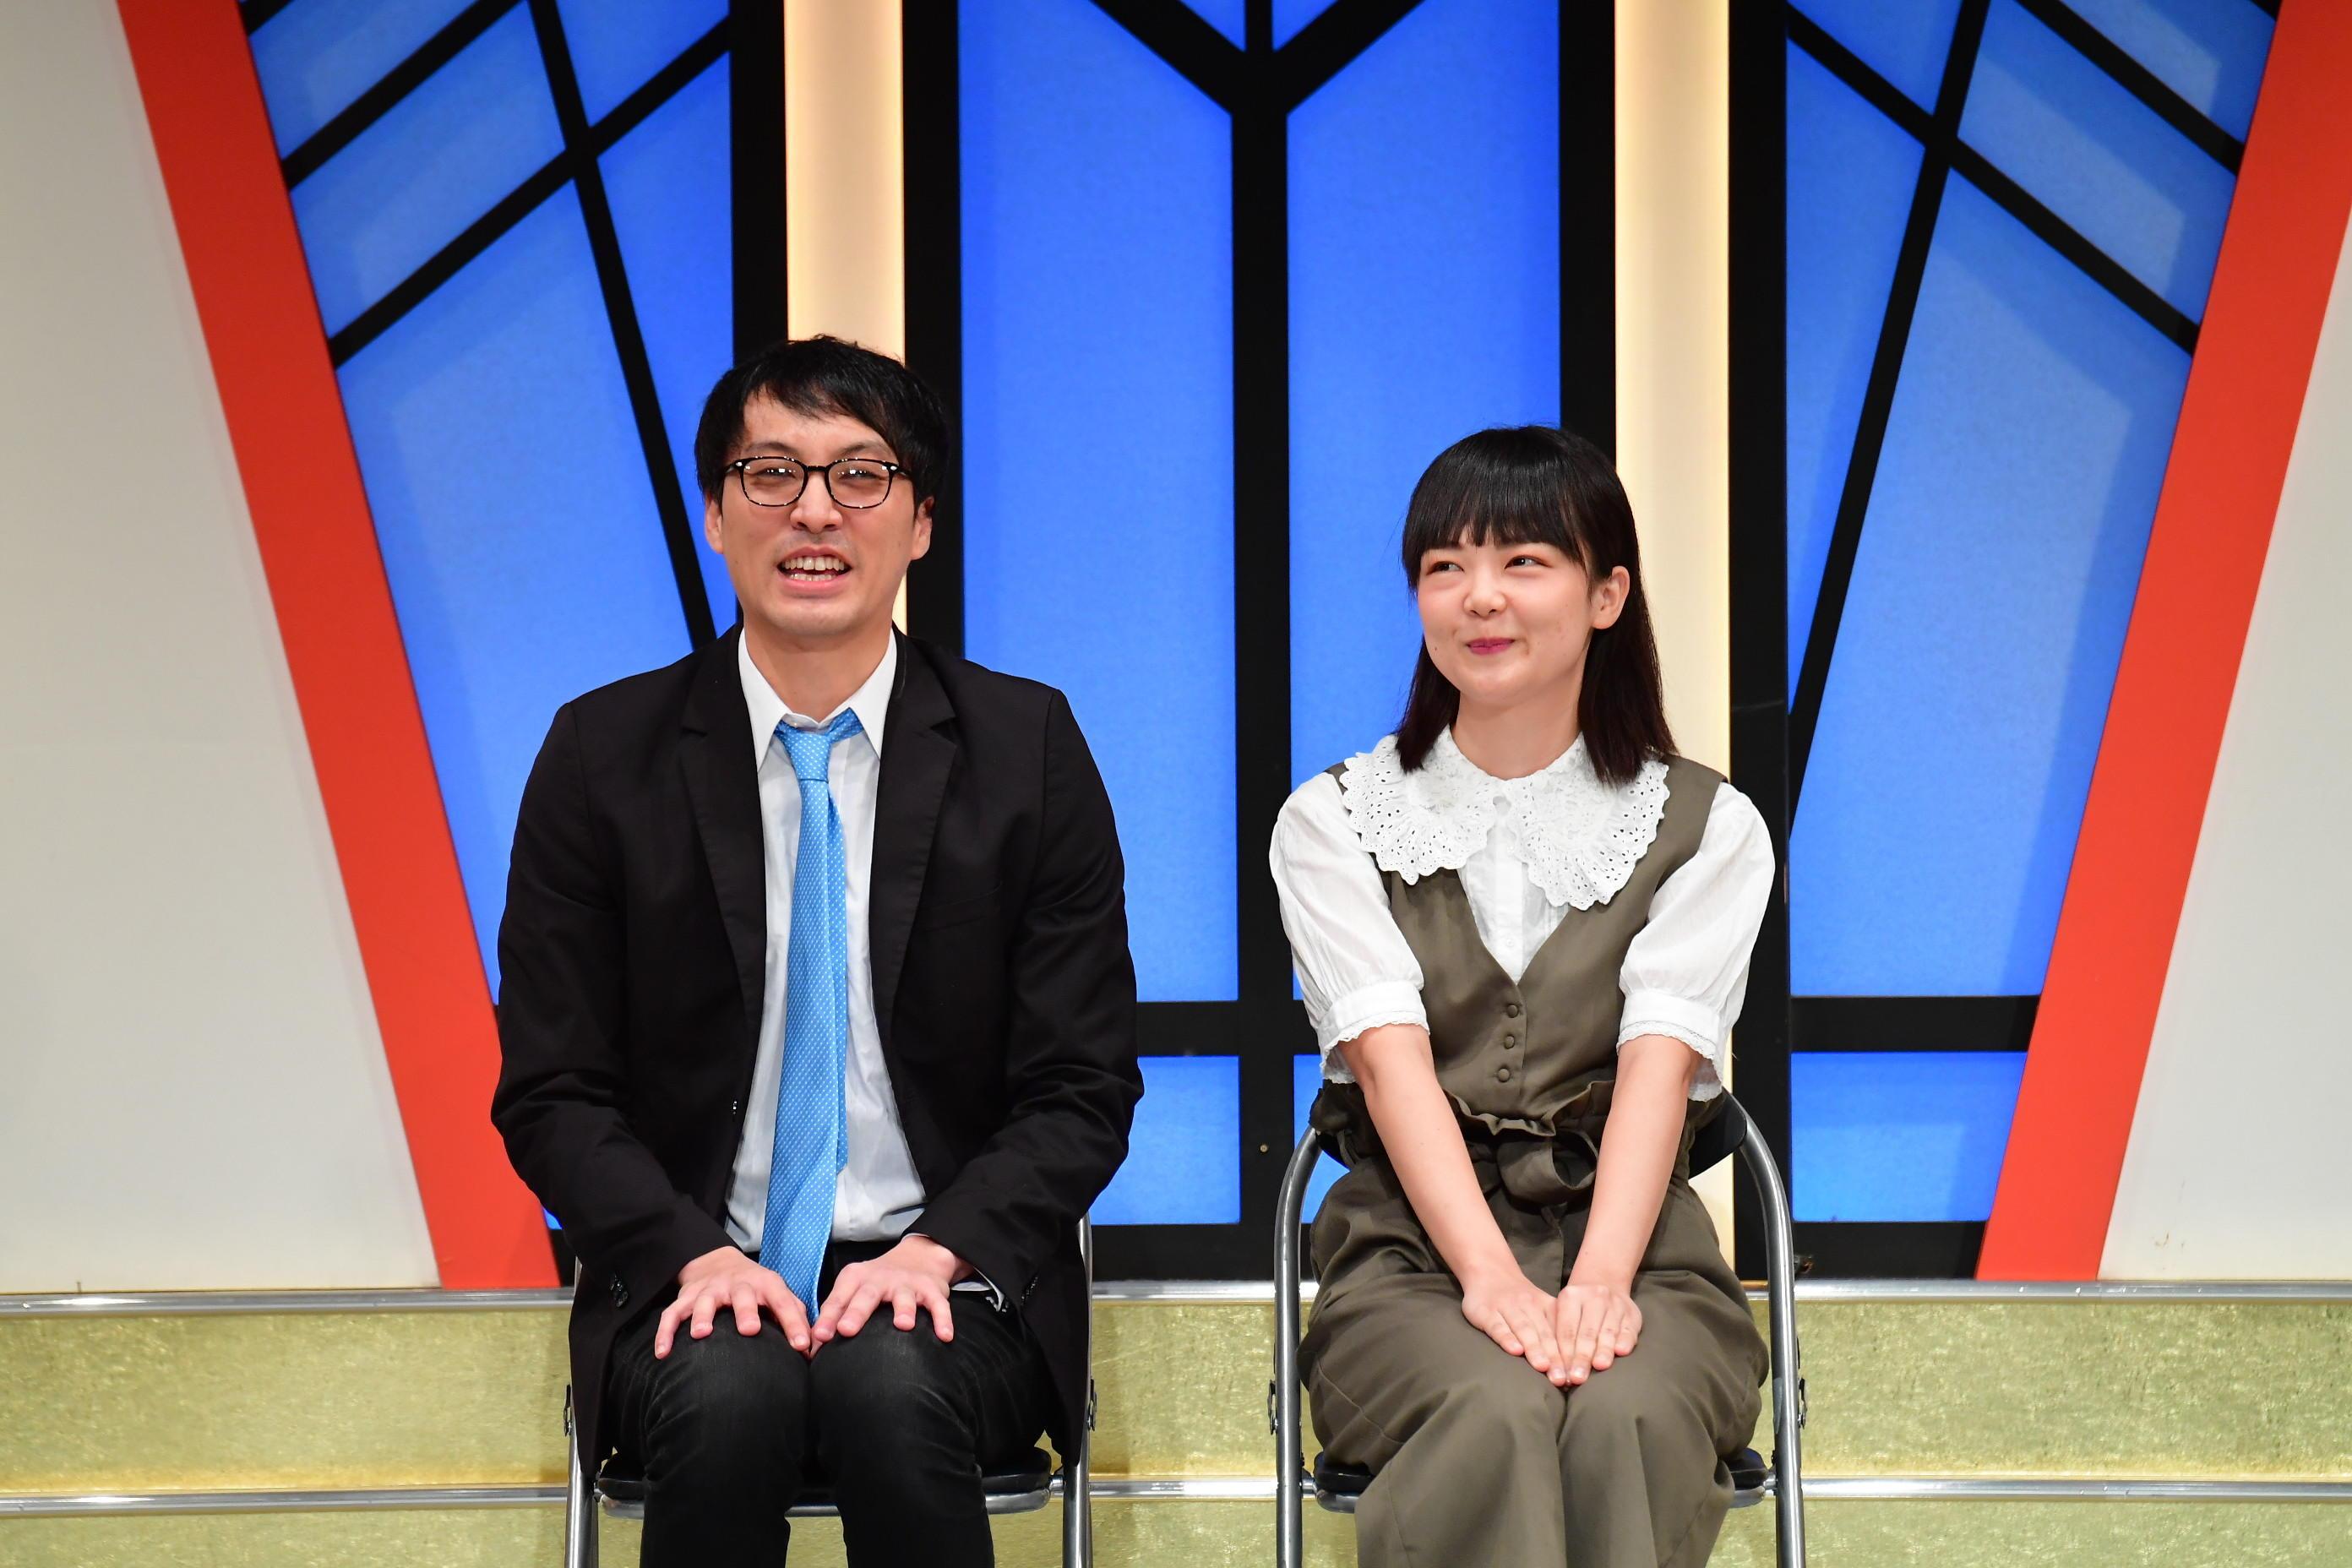 http://news.yoshimoto.co.jp/20180925142134-6cb25c6946b7c7189880c6f68a9d4704080ca326.jpg